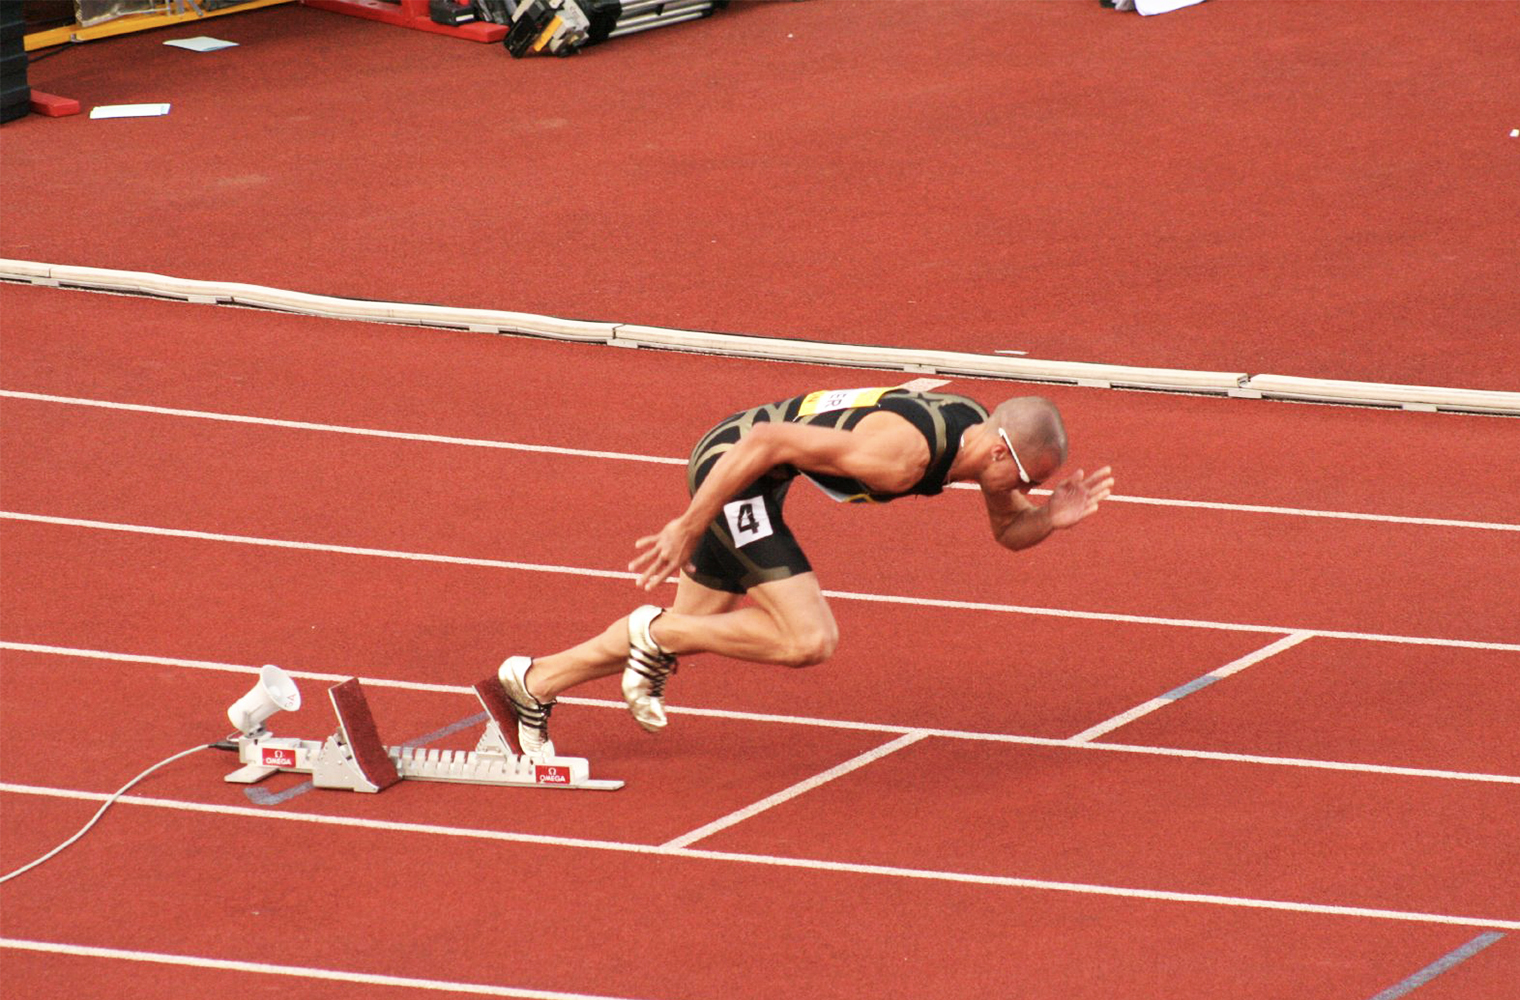 Джереми Уоринер — американский бегун, трёхкратный олимпийский чемпион